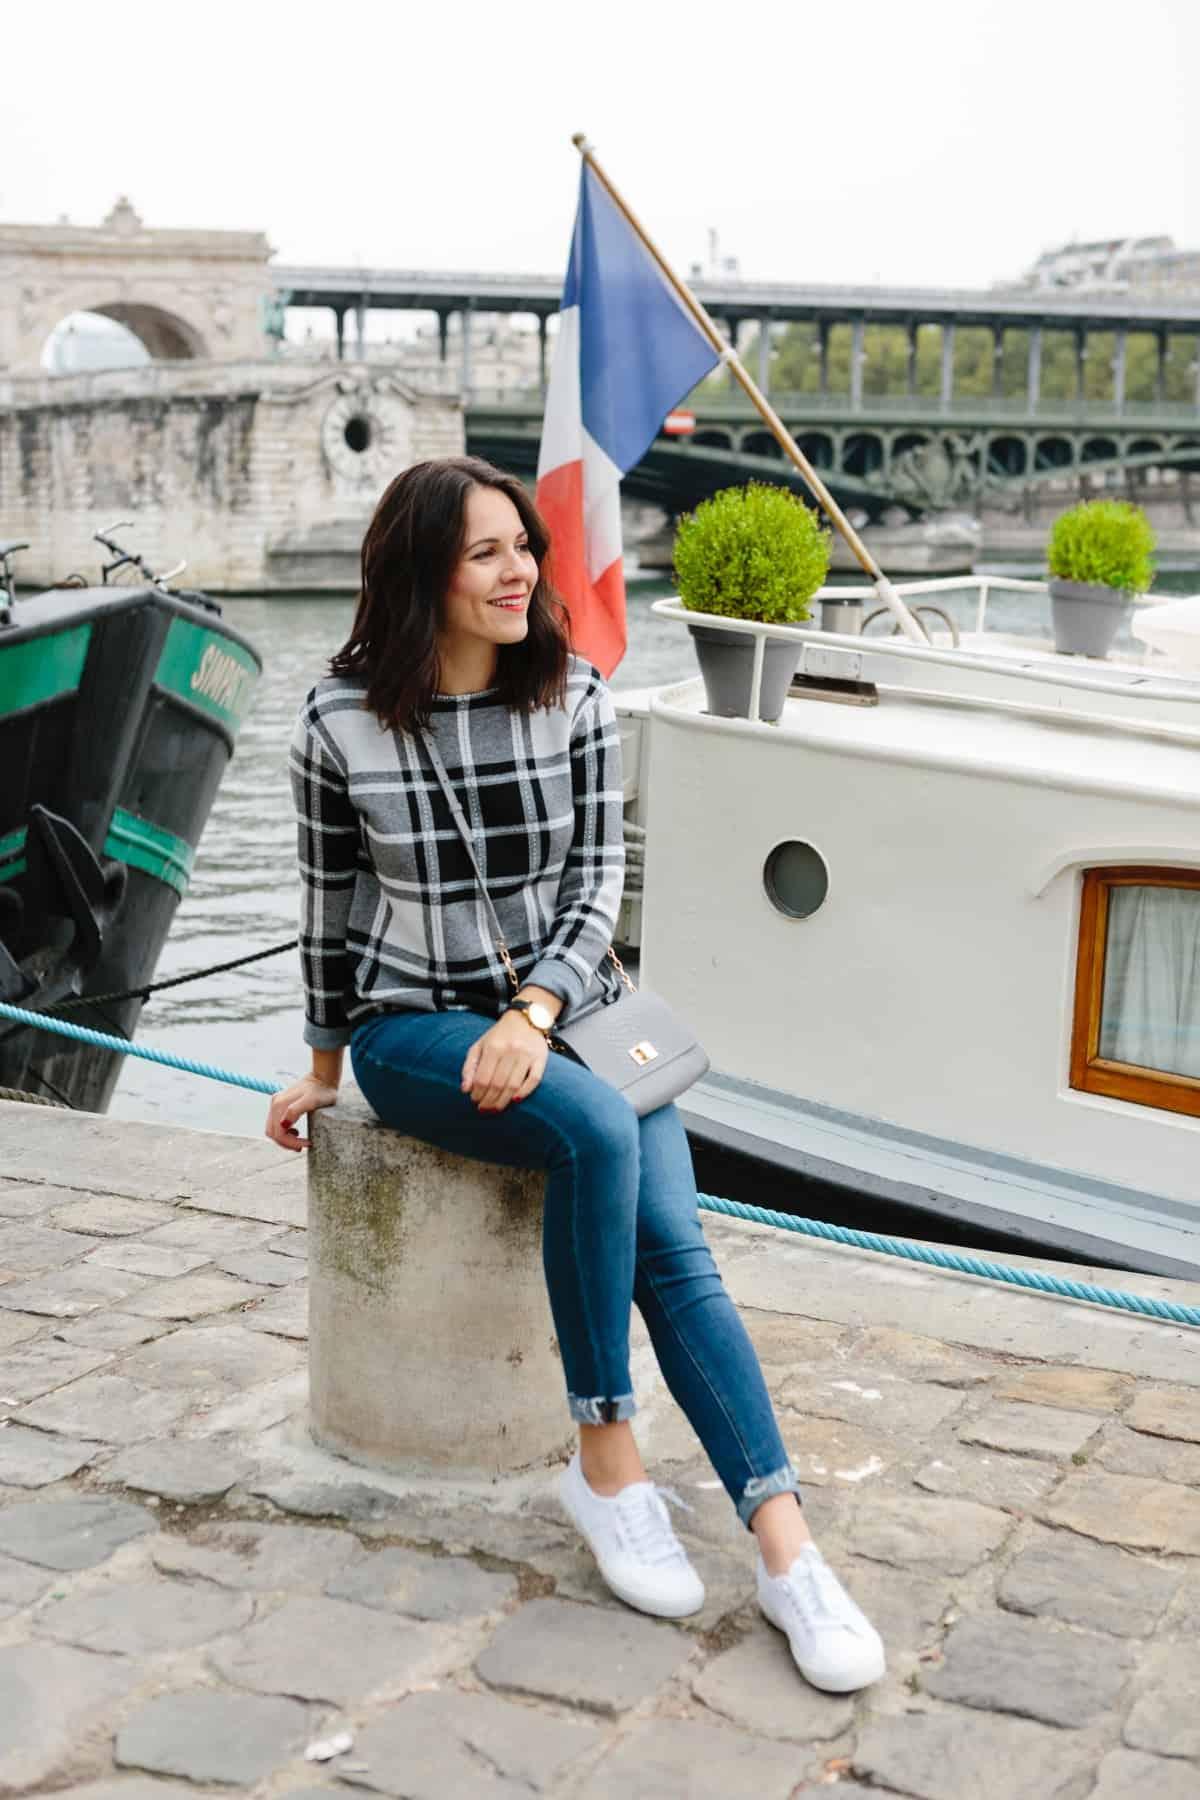 J. Jill plaid sweater, fall outfit ideas, Paris outfit ideas - My Style Vita @mystylevita